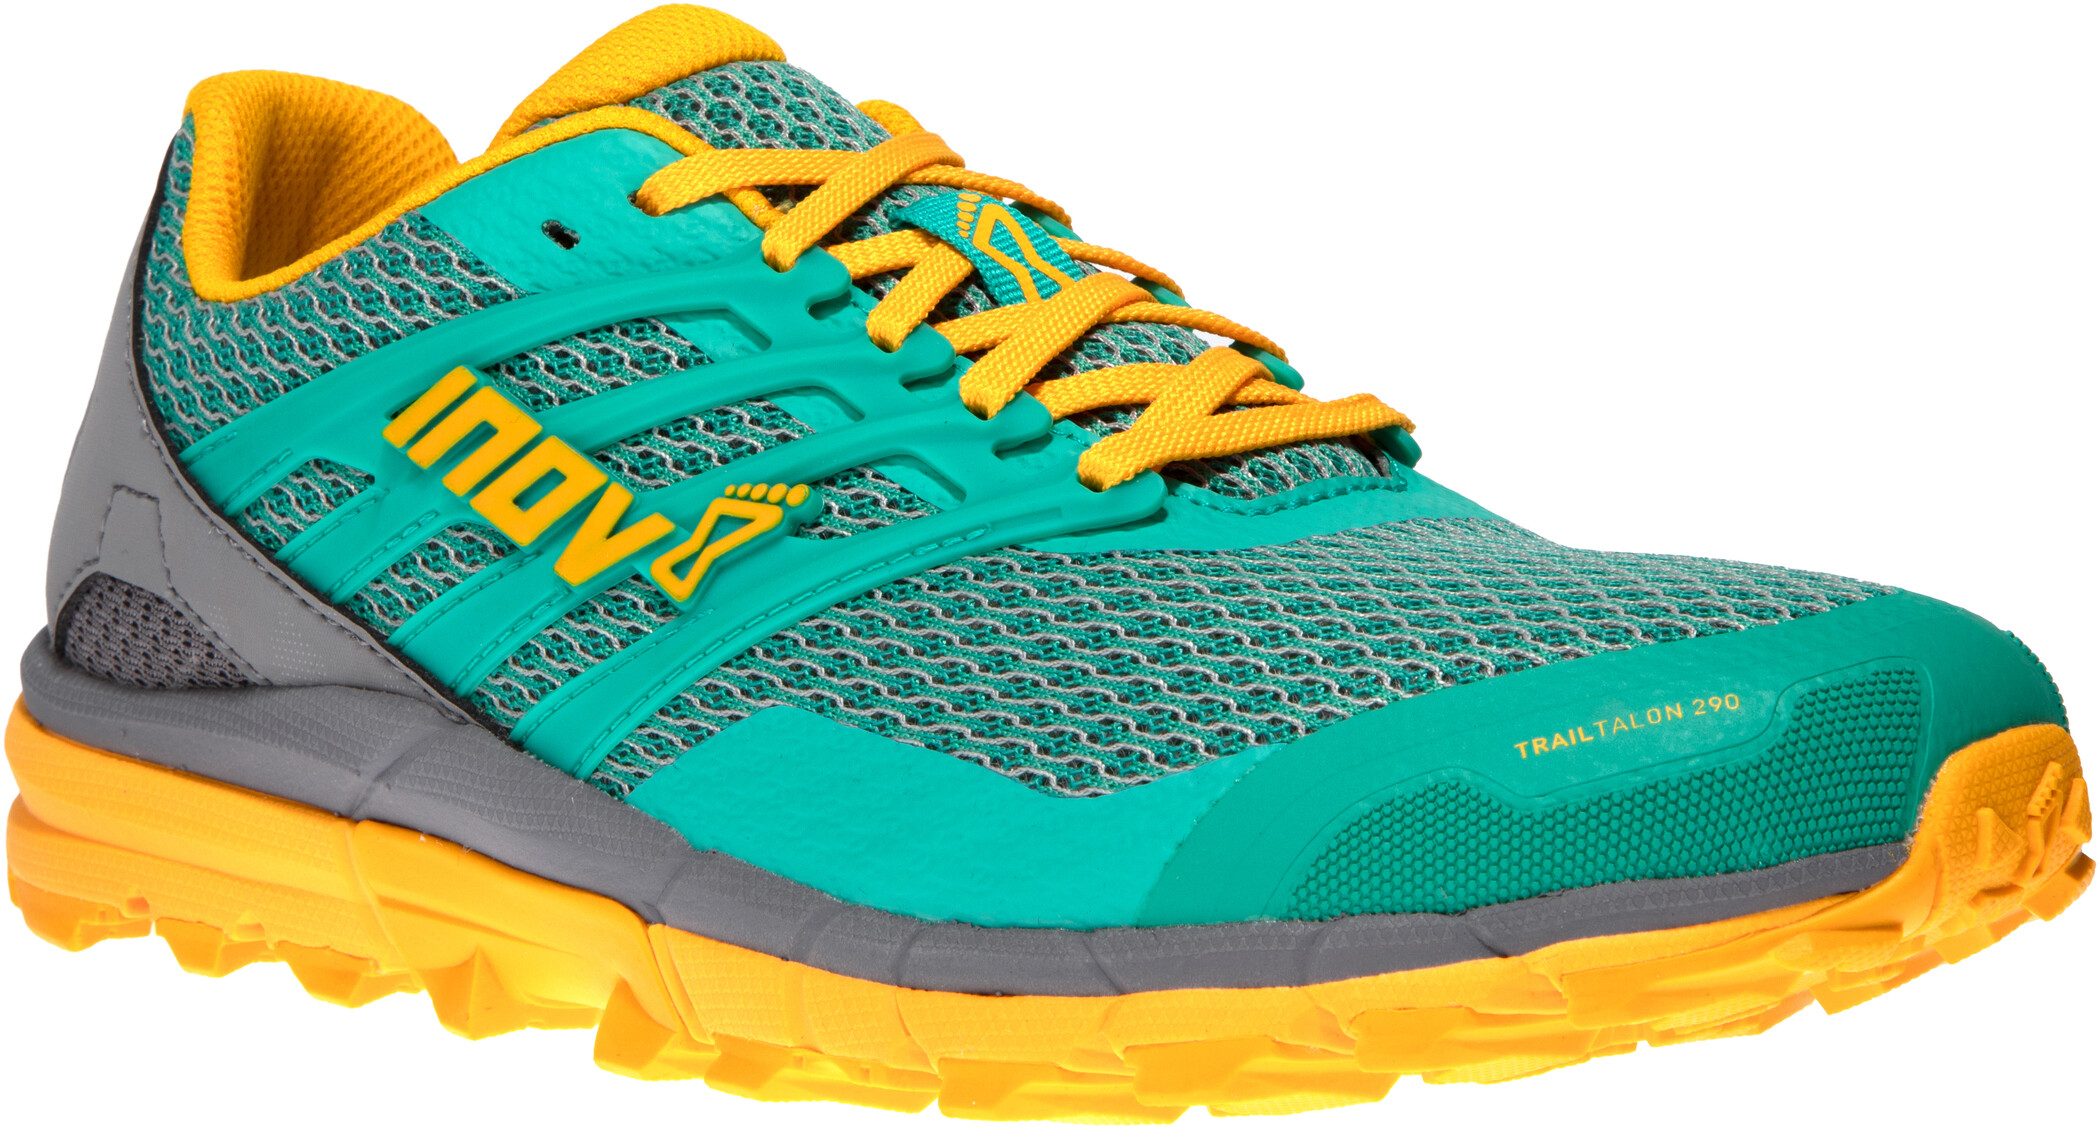 inov 8 Trailtalon 290 Shoes Dam tealgreyyellow